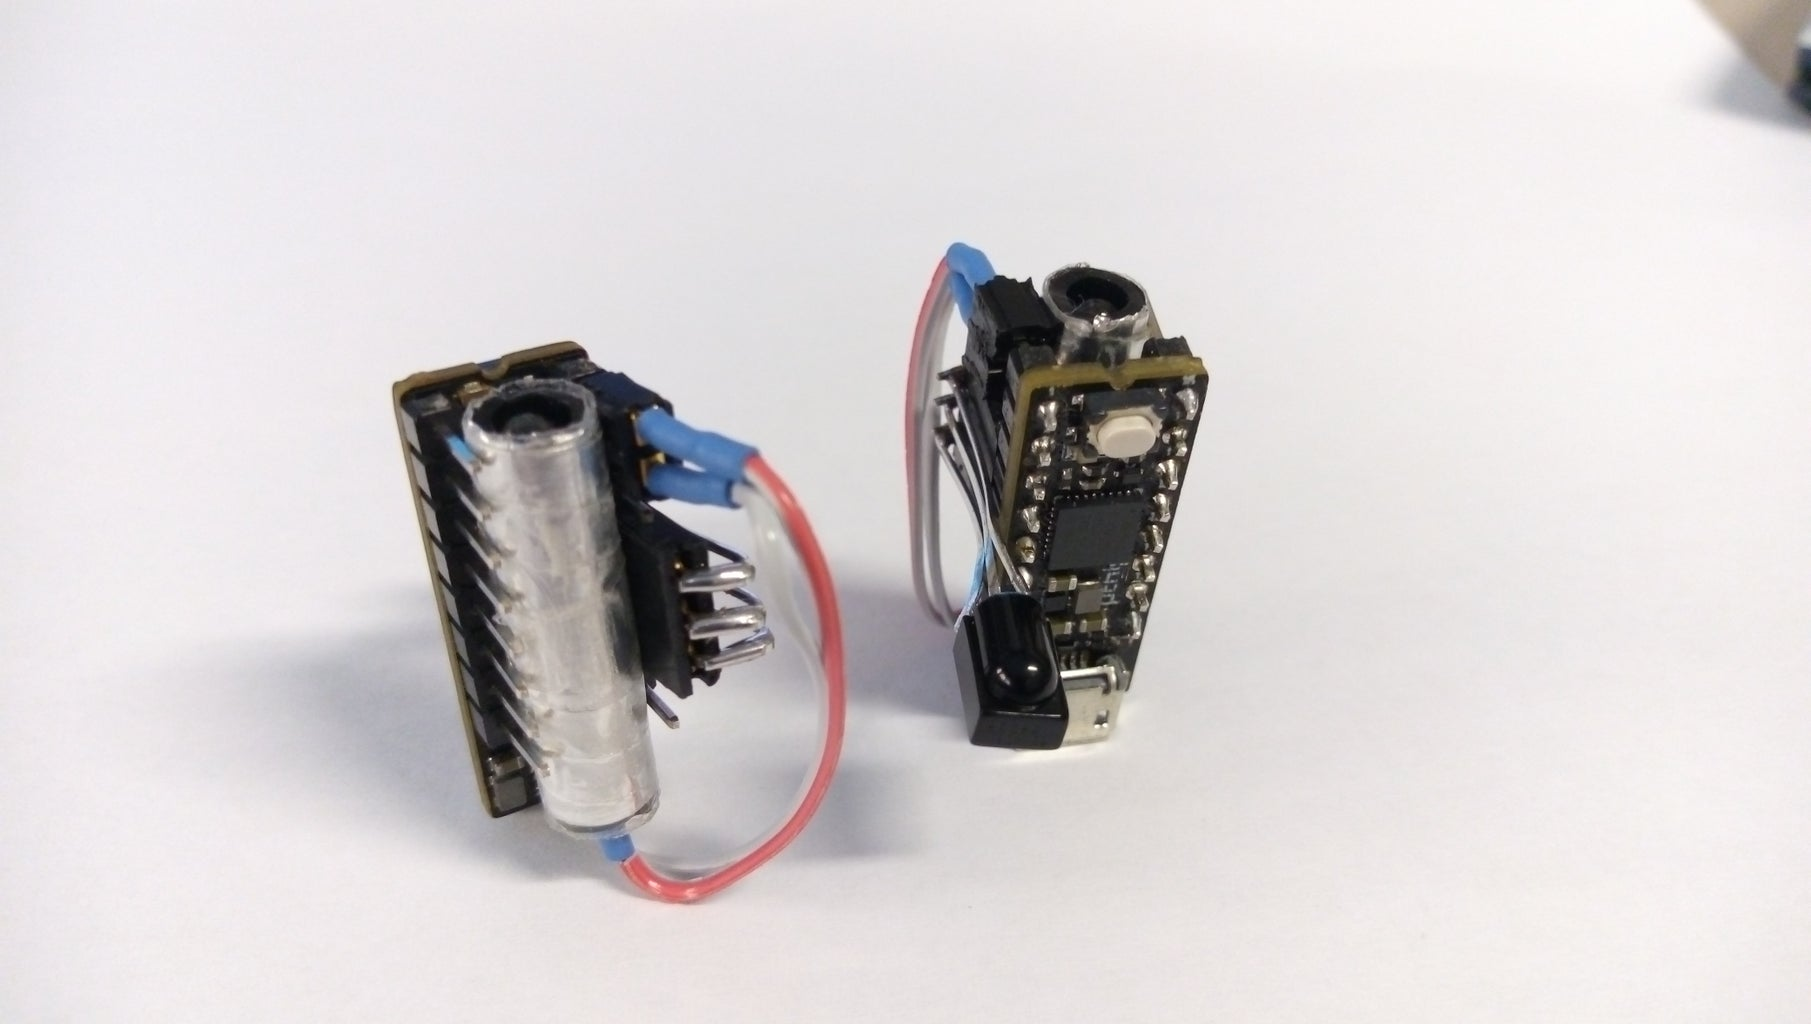 Shielding IR LED